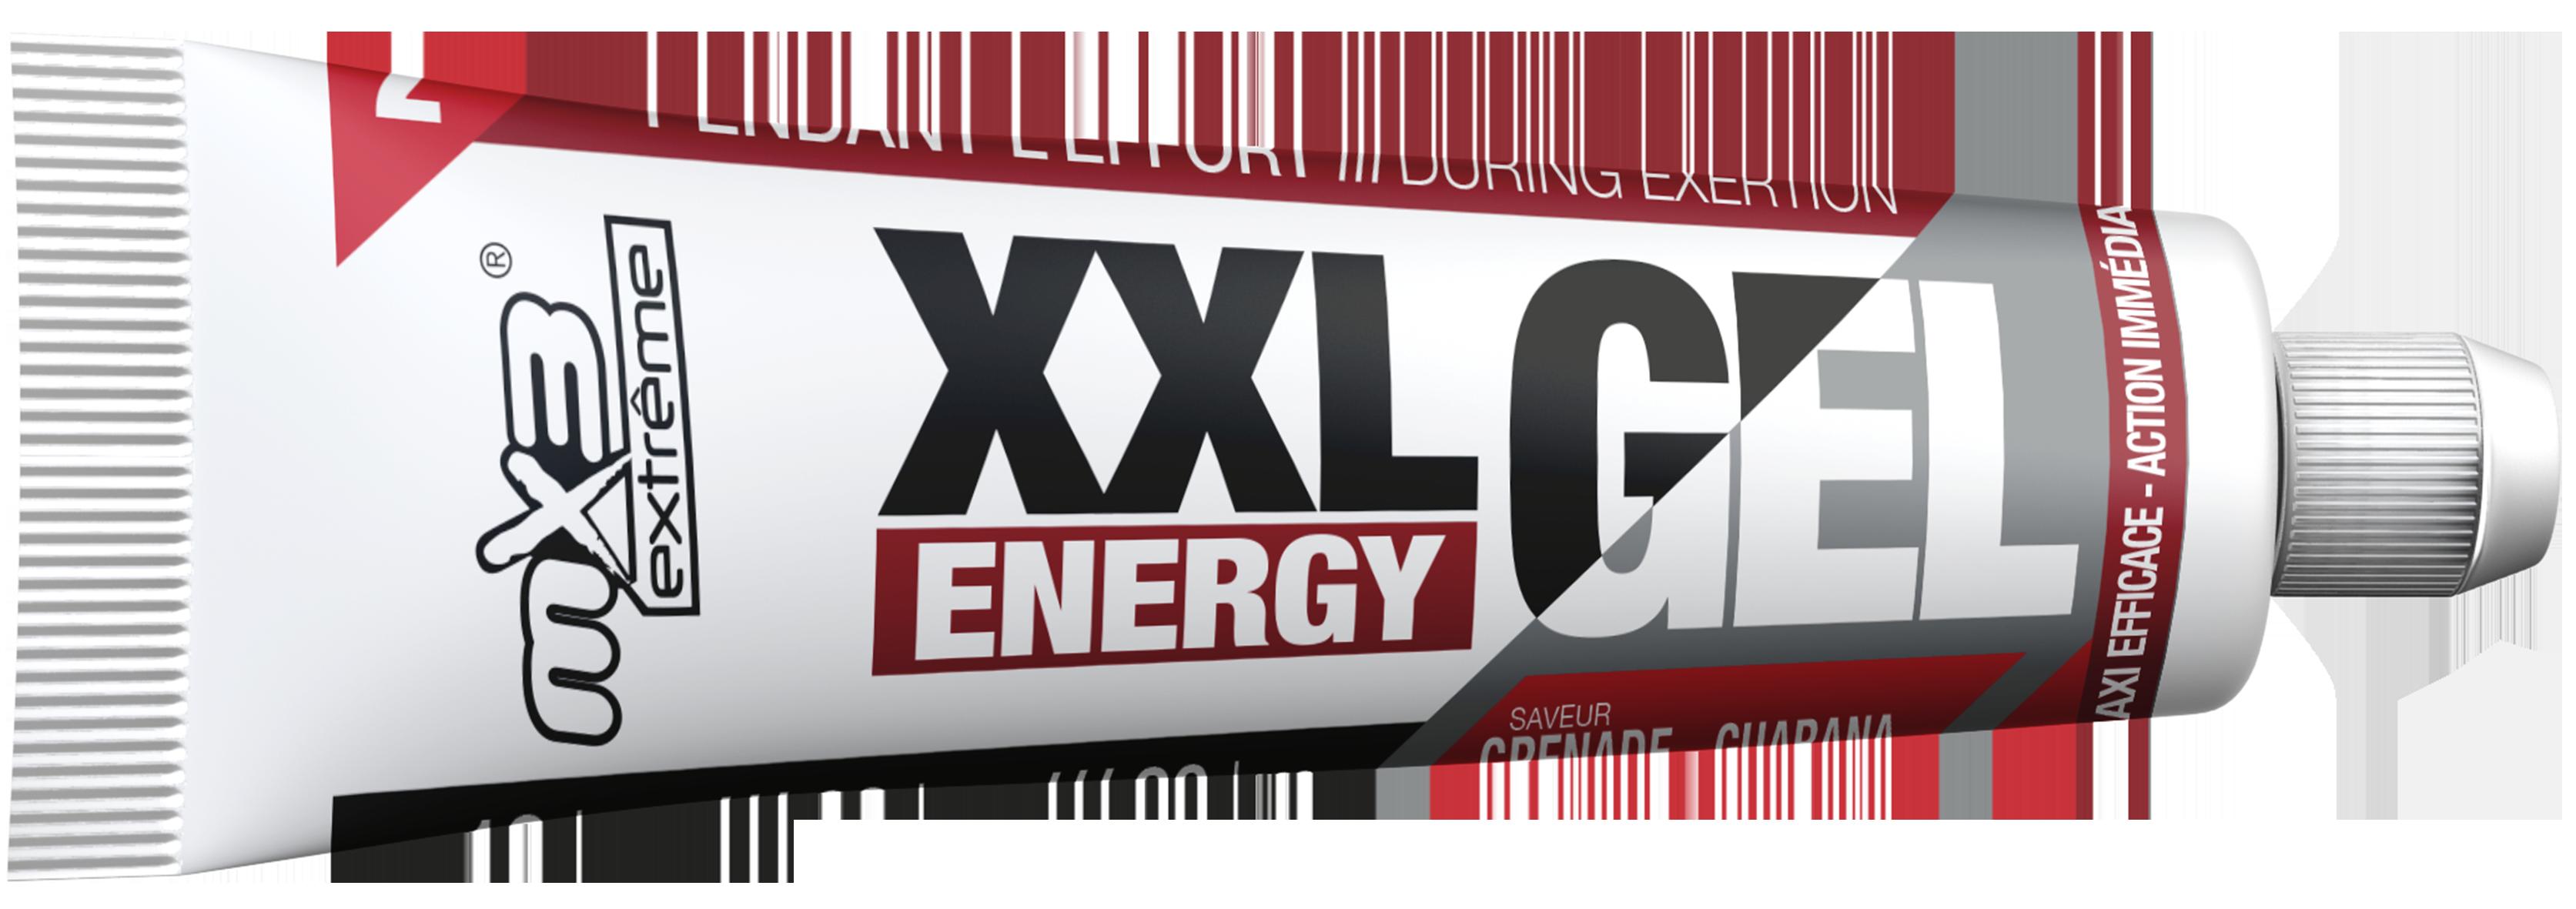 Gel énergétique XXL MX3